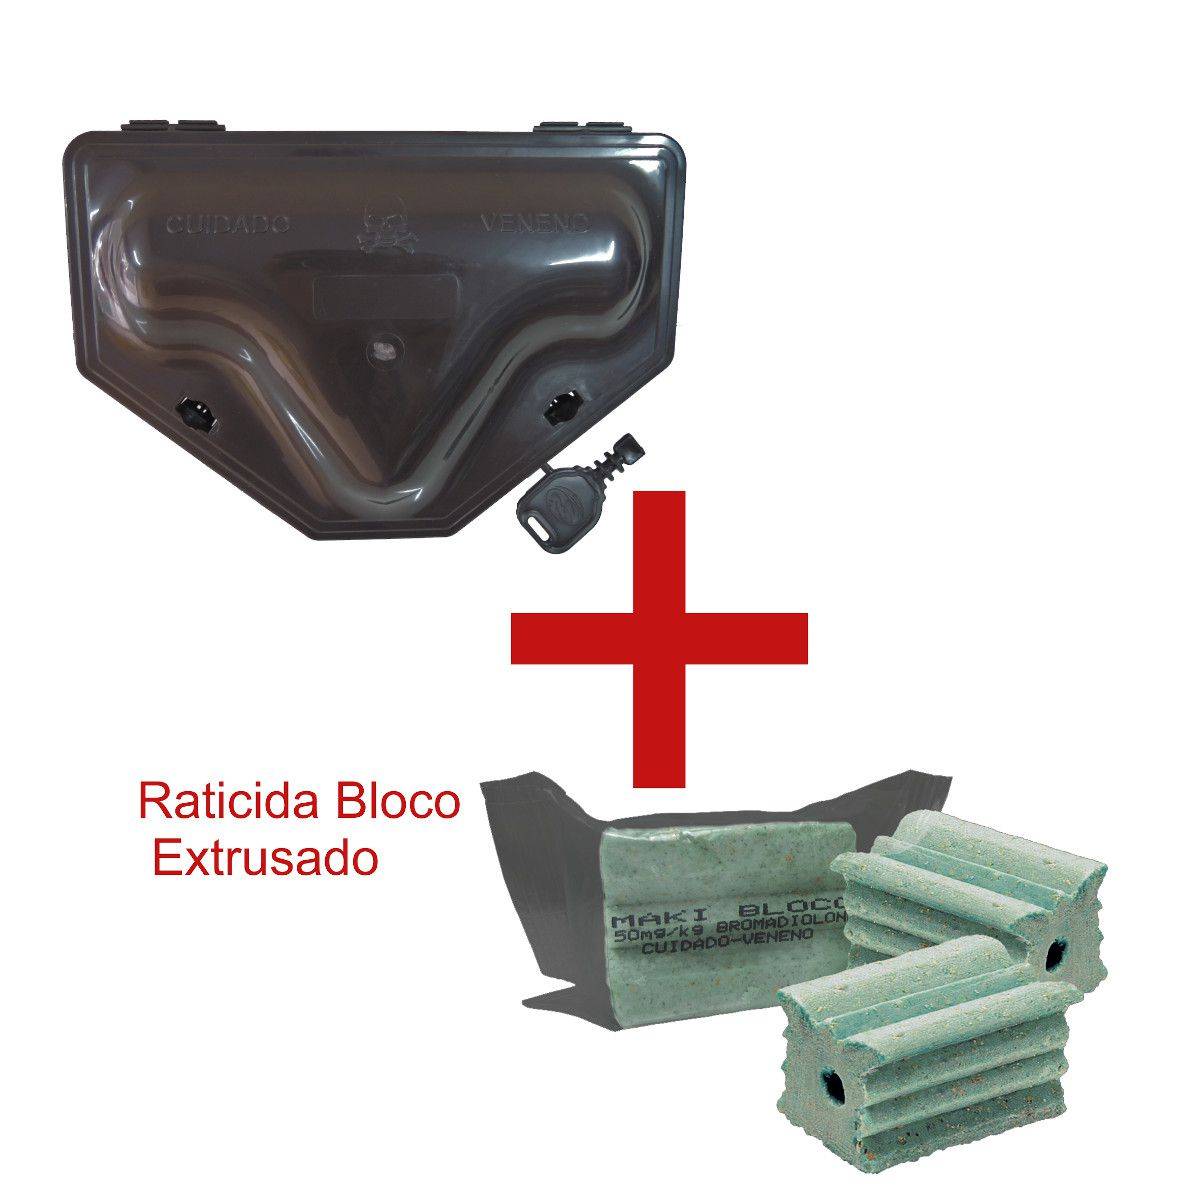 KIT 900 Armadilha Pega Mata Porta Iscas Forte 2 TRAVAS Chave